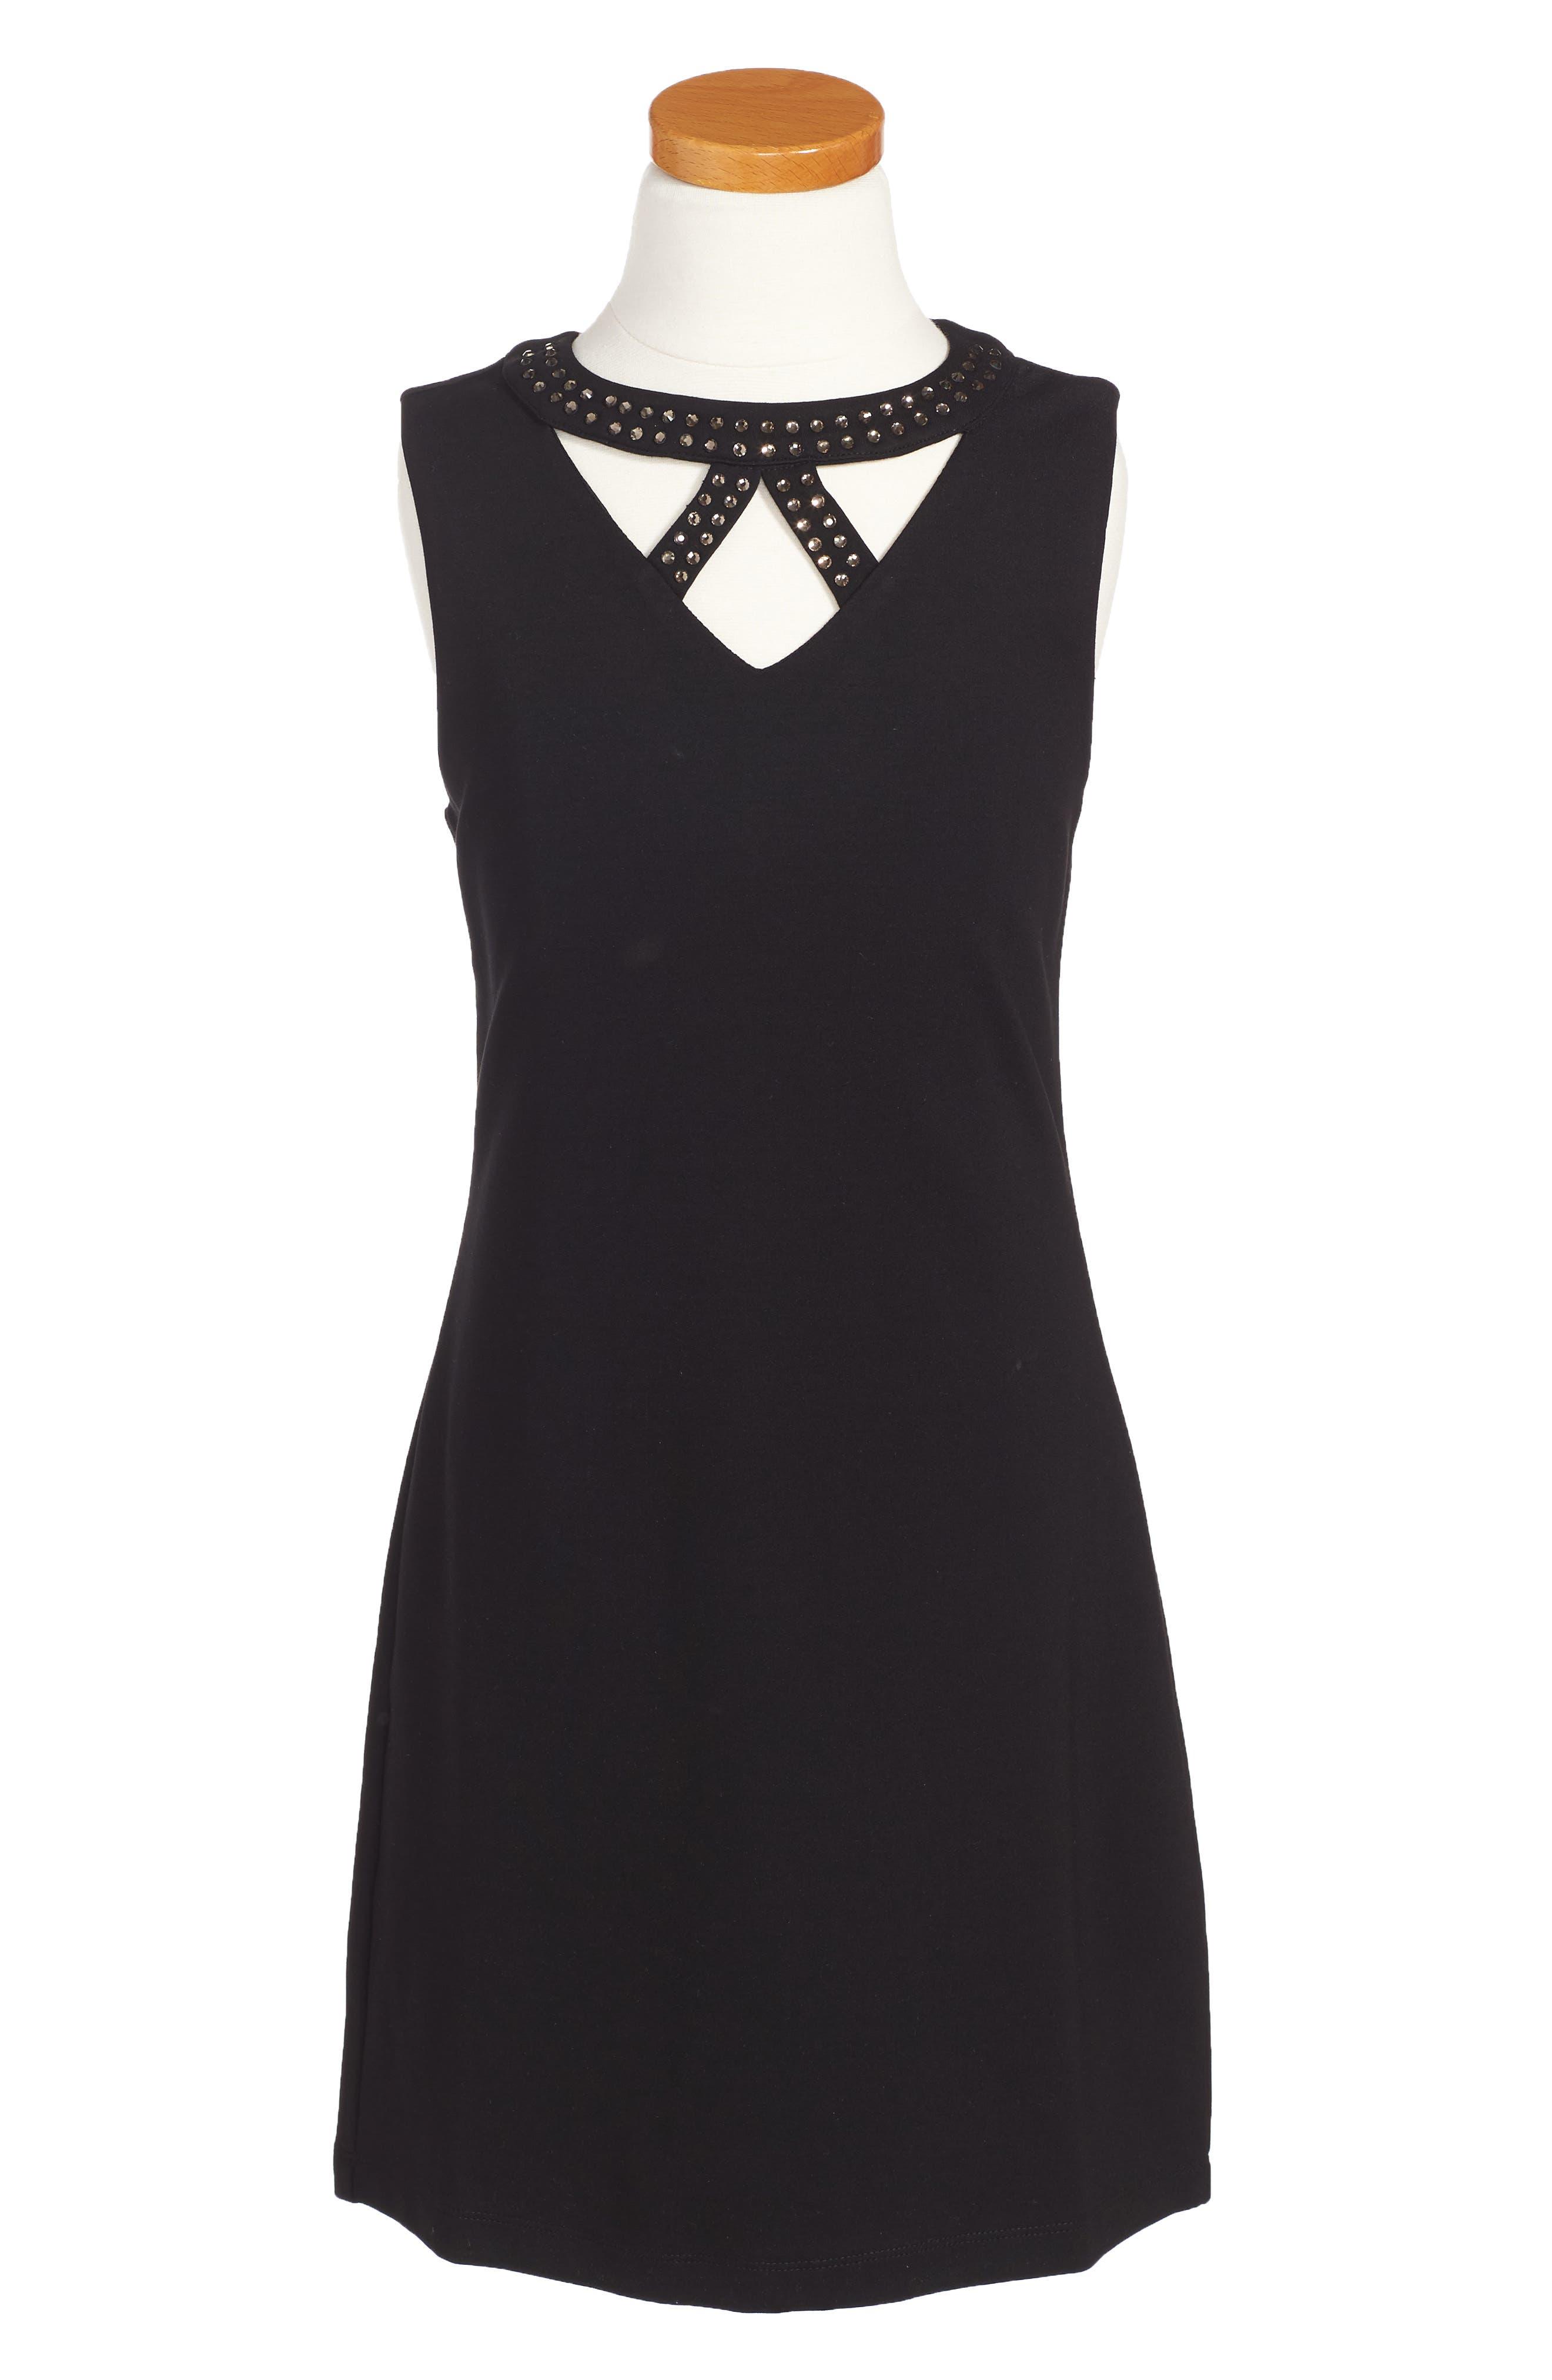 Ponti Dress,                         Main,                         color, 001